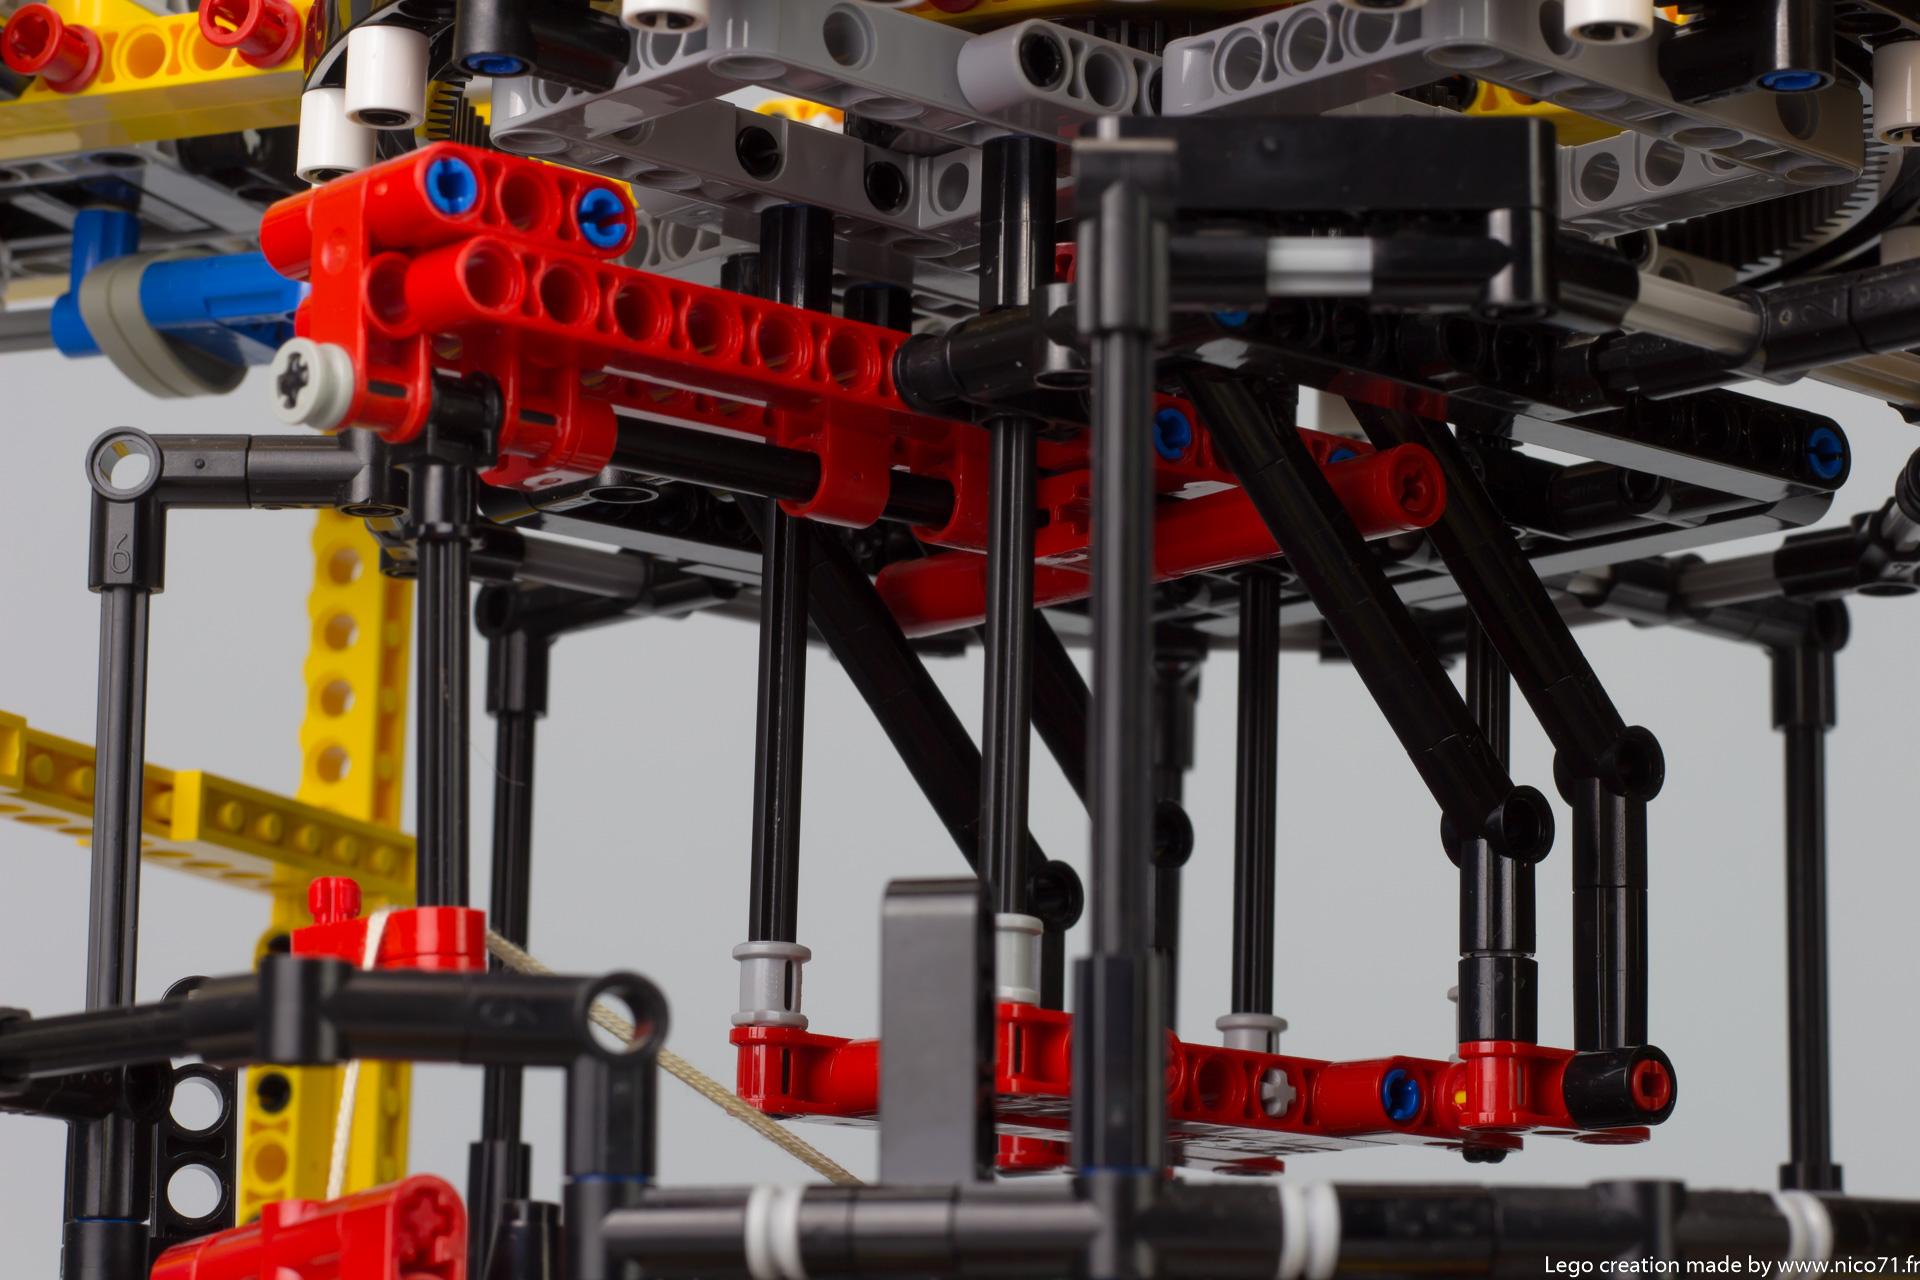 lego-technic-kumihimo-braiding-machine-8